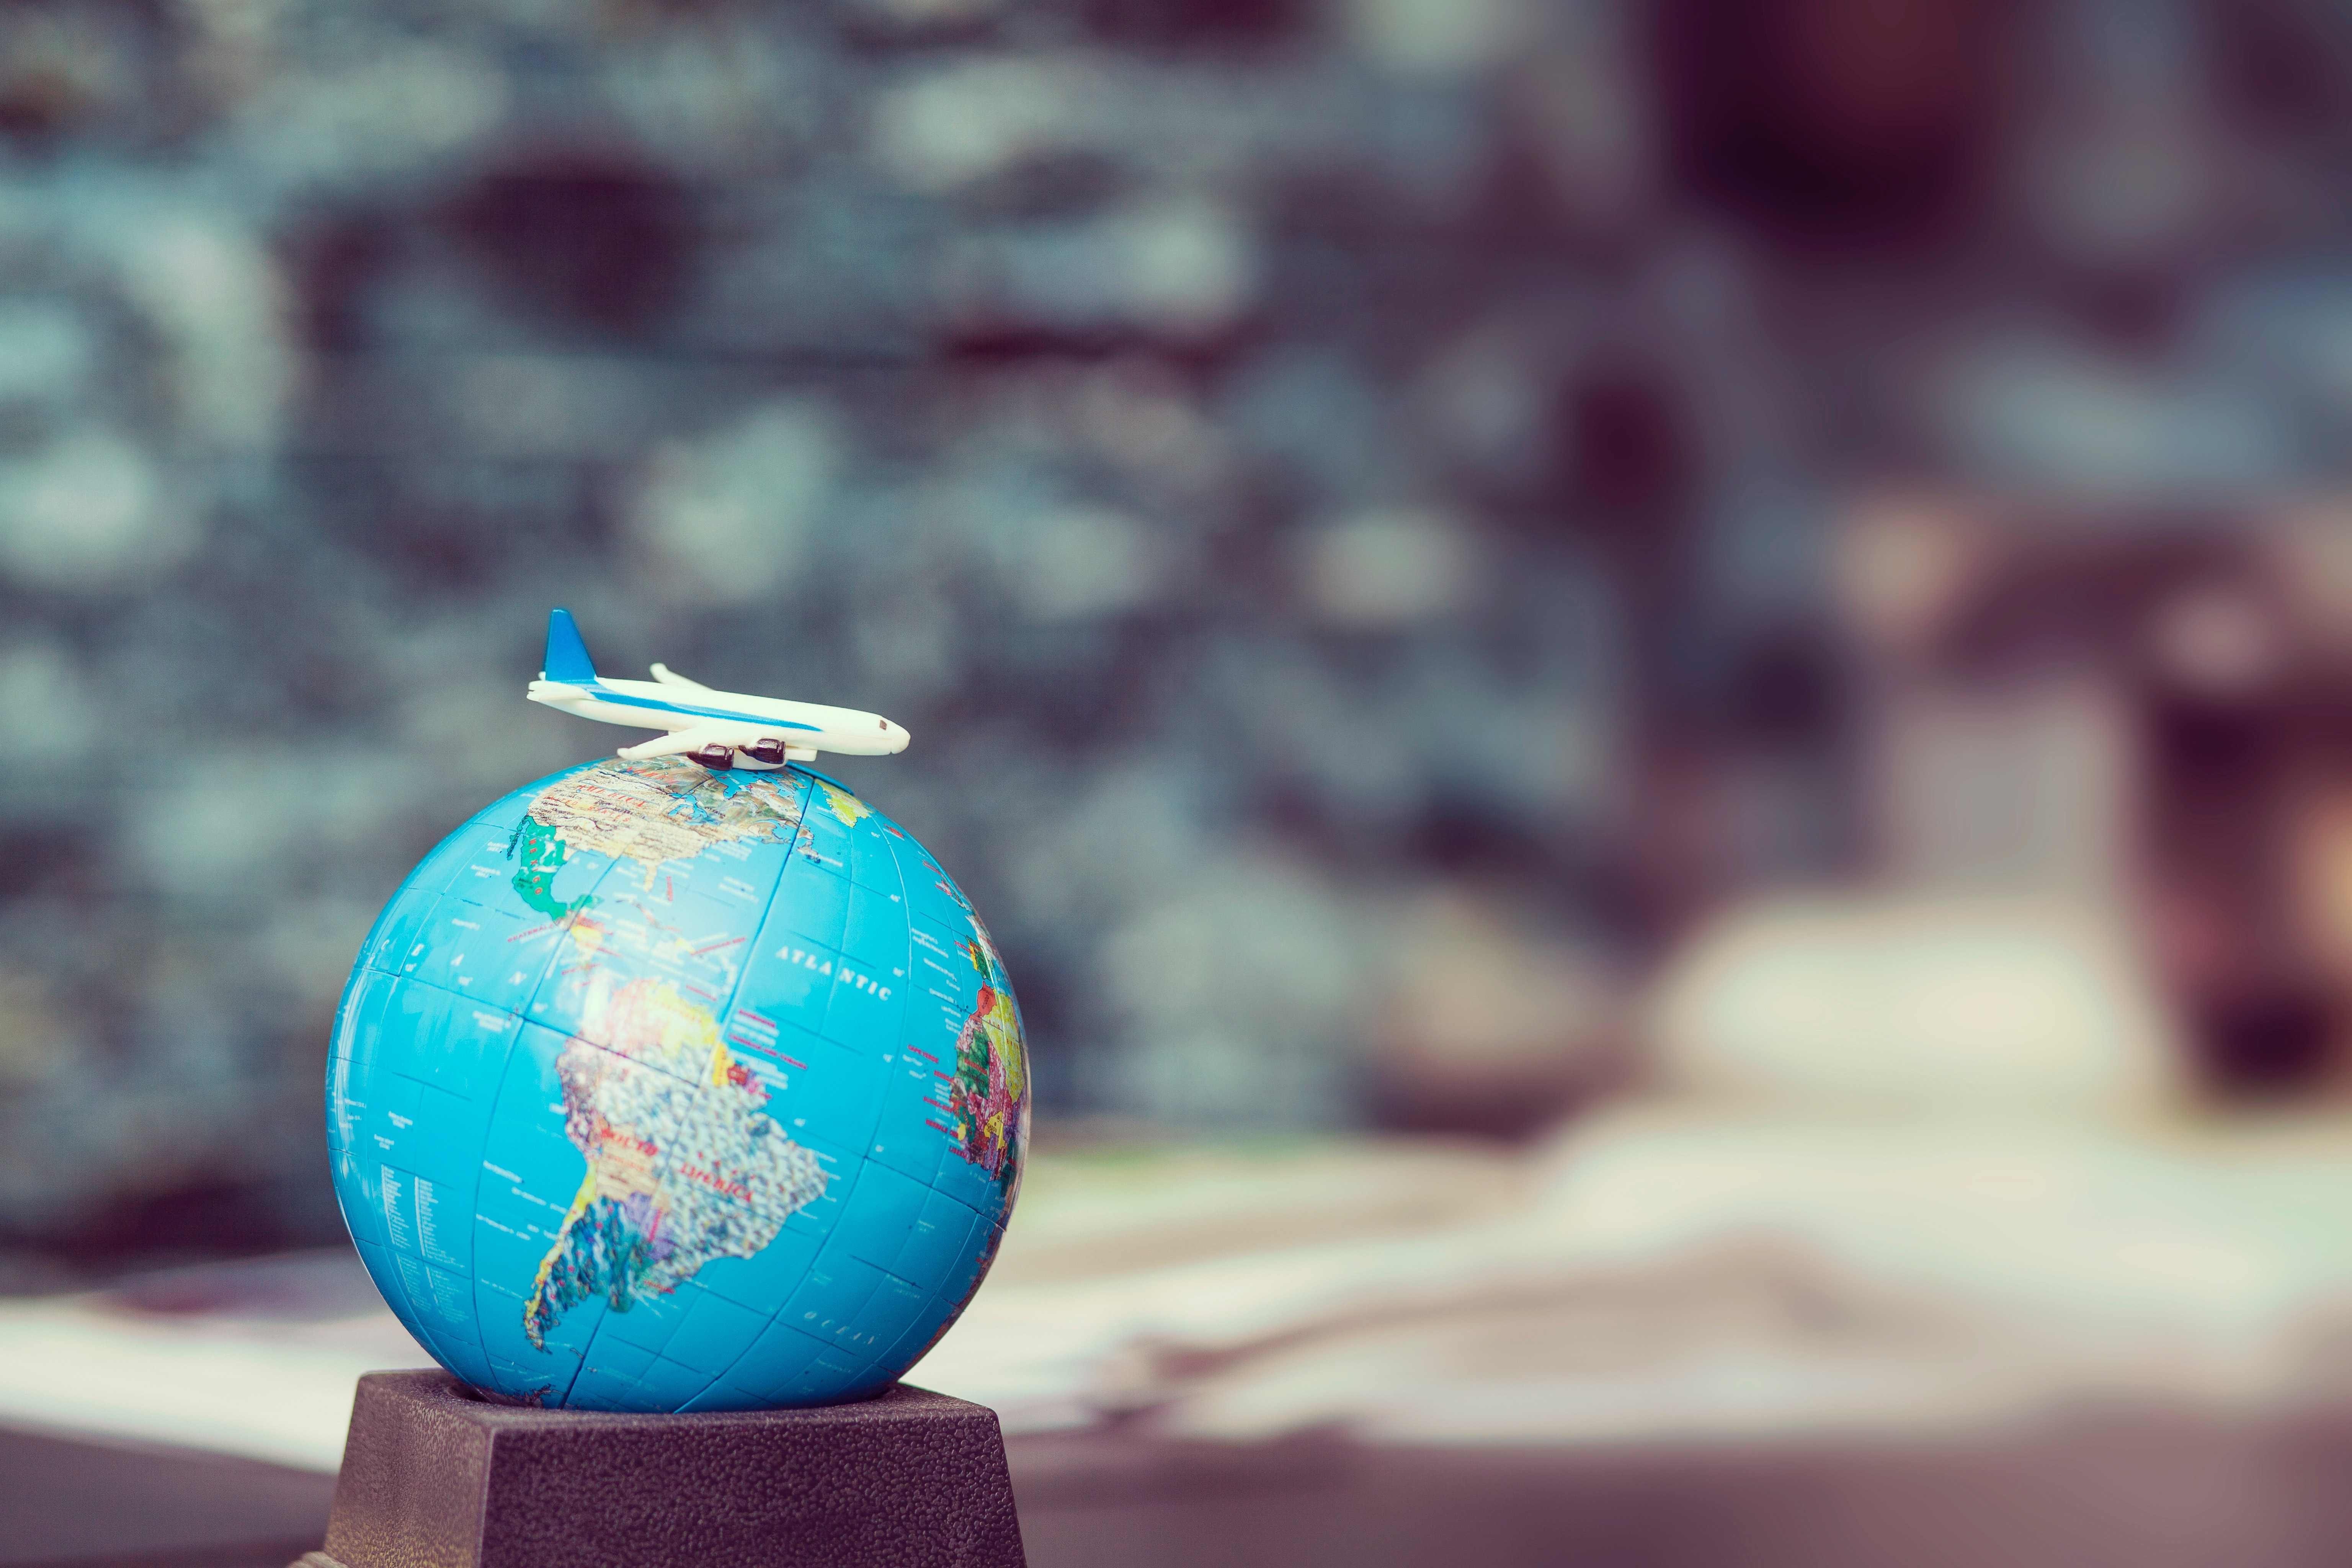 voyage avion terre planète monde